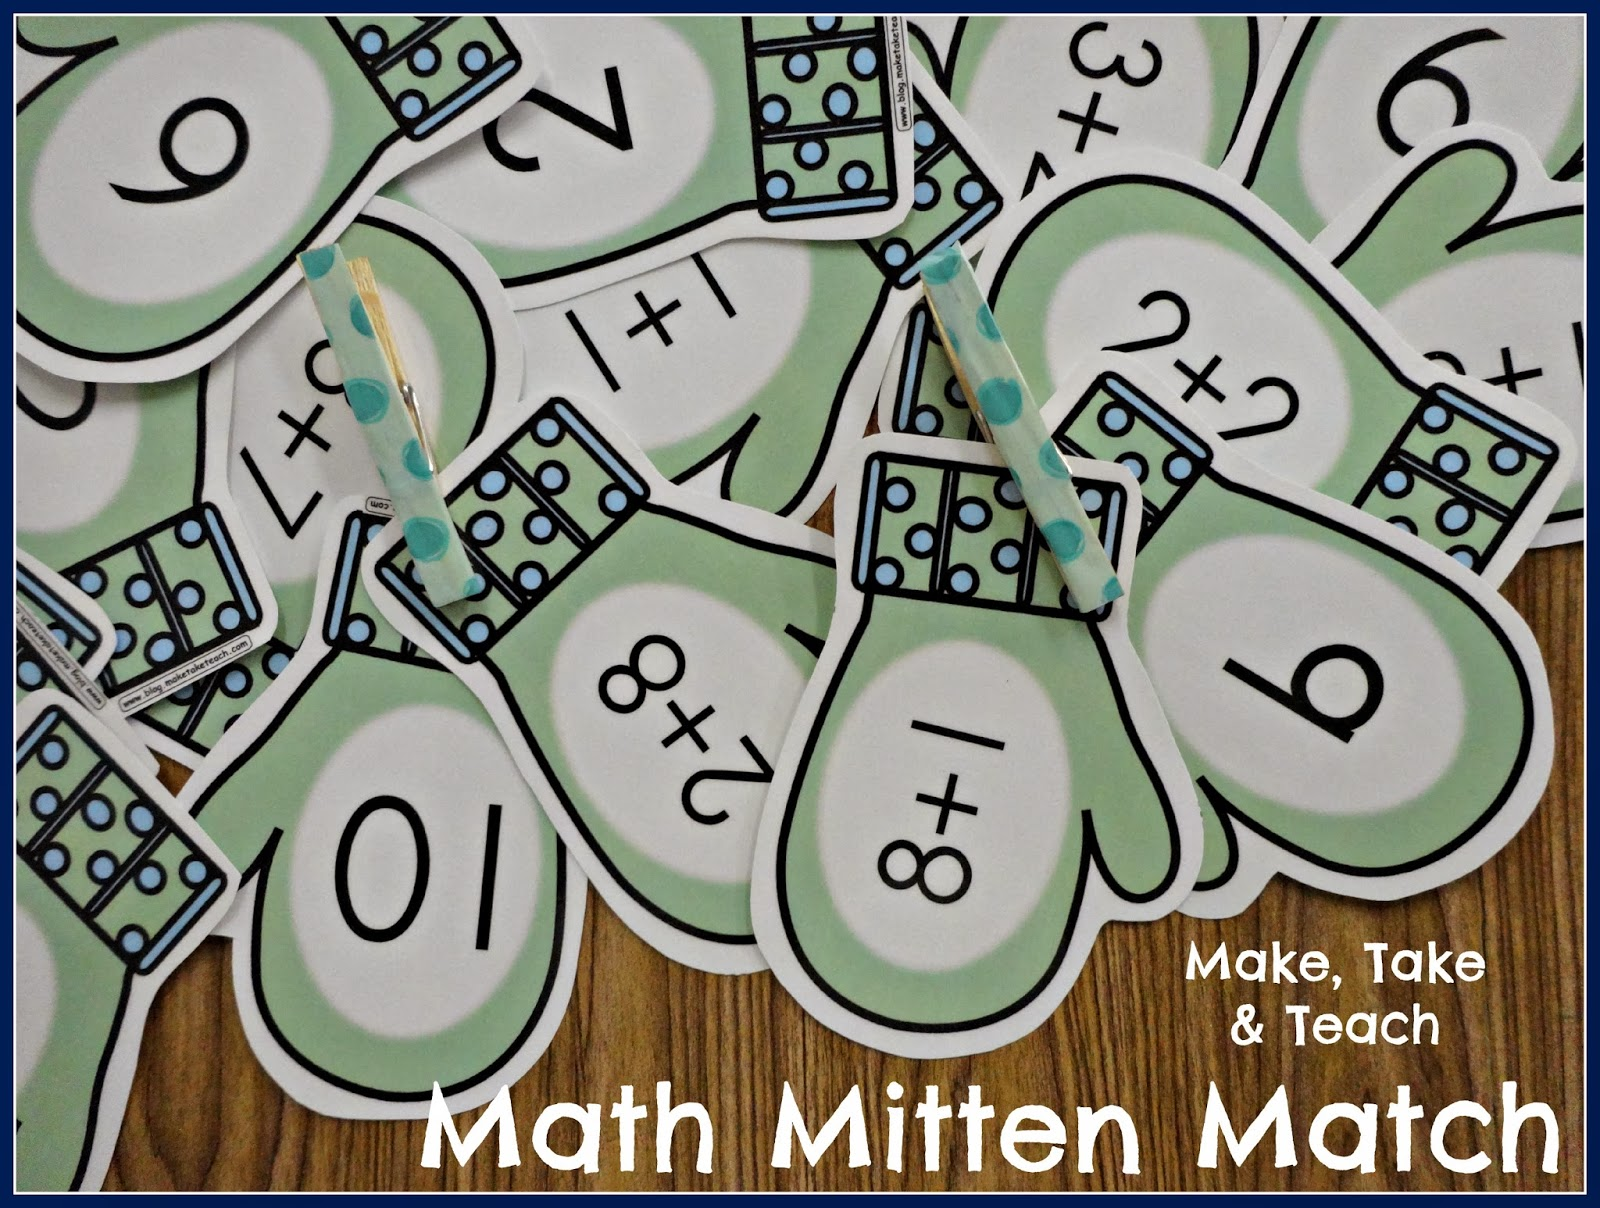 Mitten Match Activity For Addition